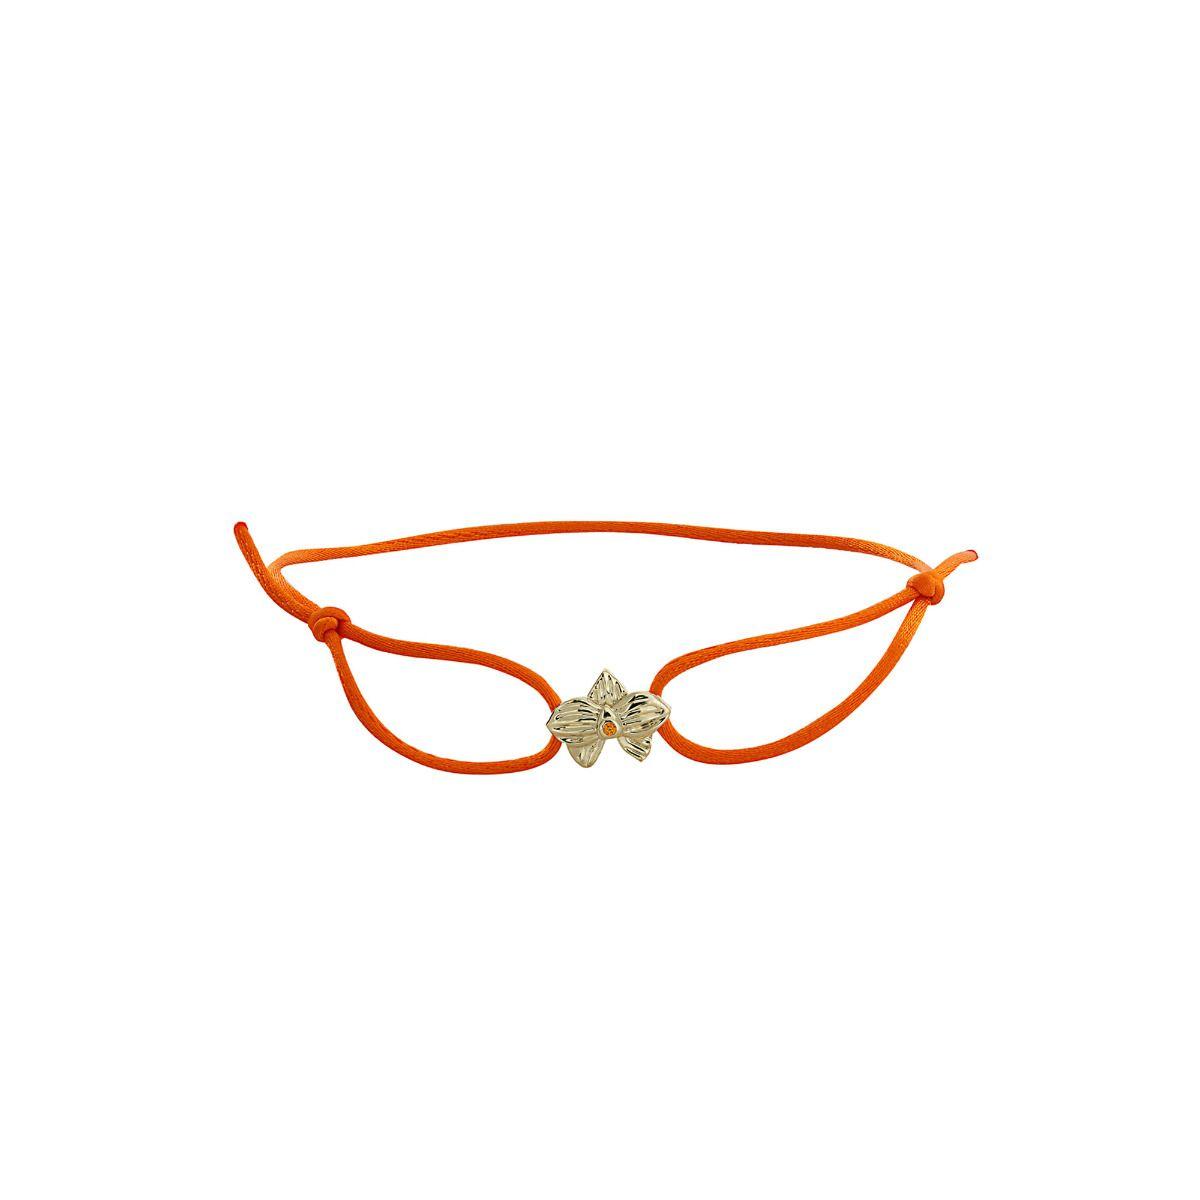 Allyn's Orchard 14k Gold Orange Silk Cord Bracelet